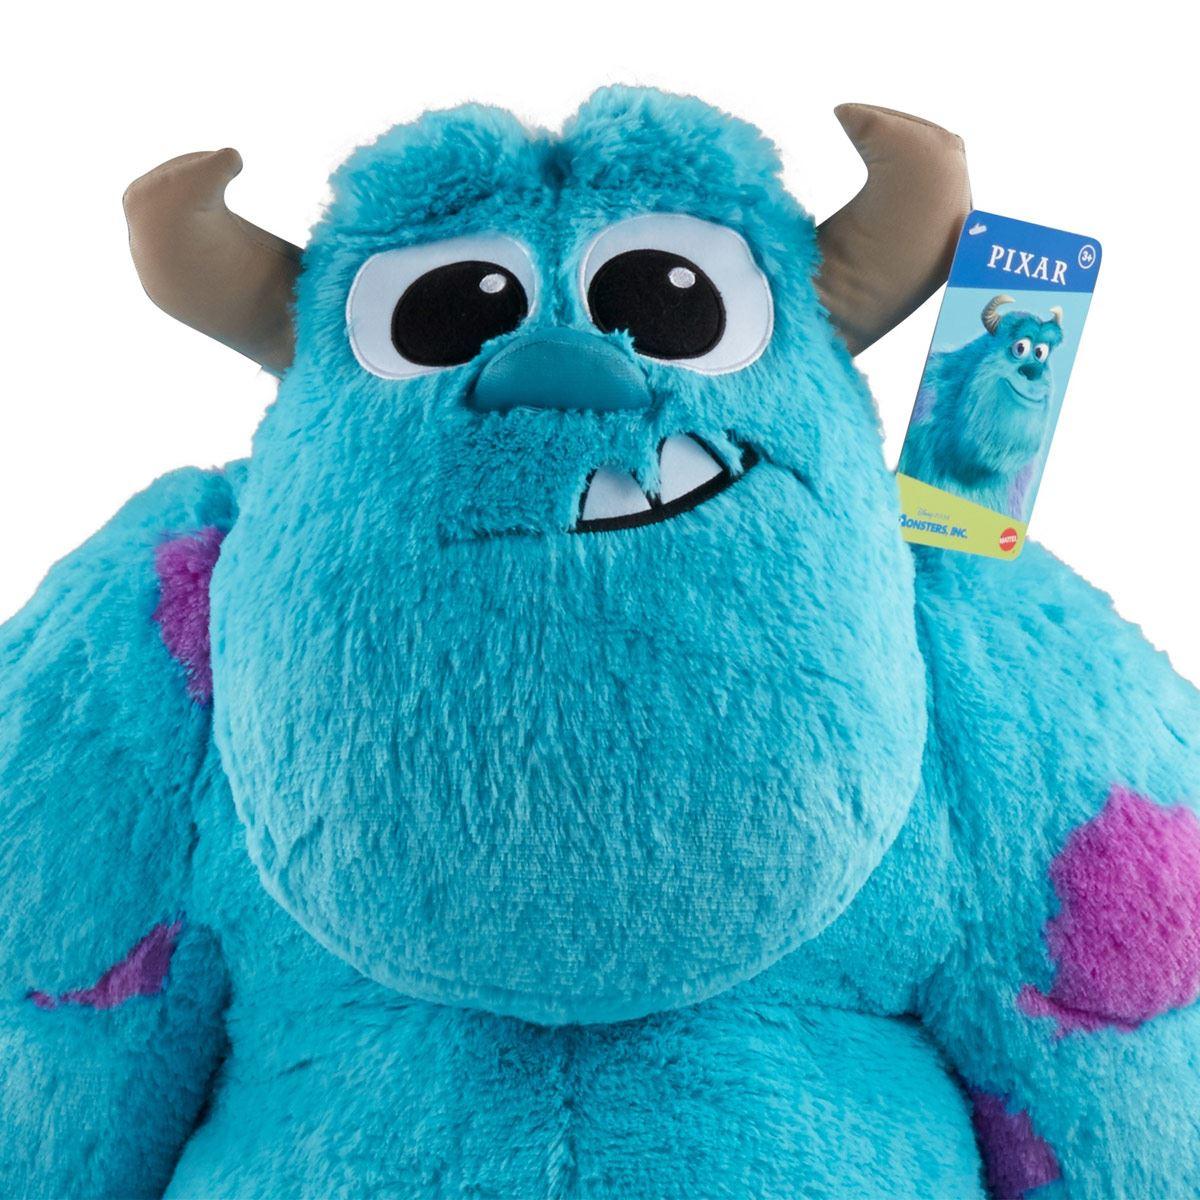 Disney Pixar Monsters Inc Peluche Gigante de Sulley